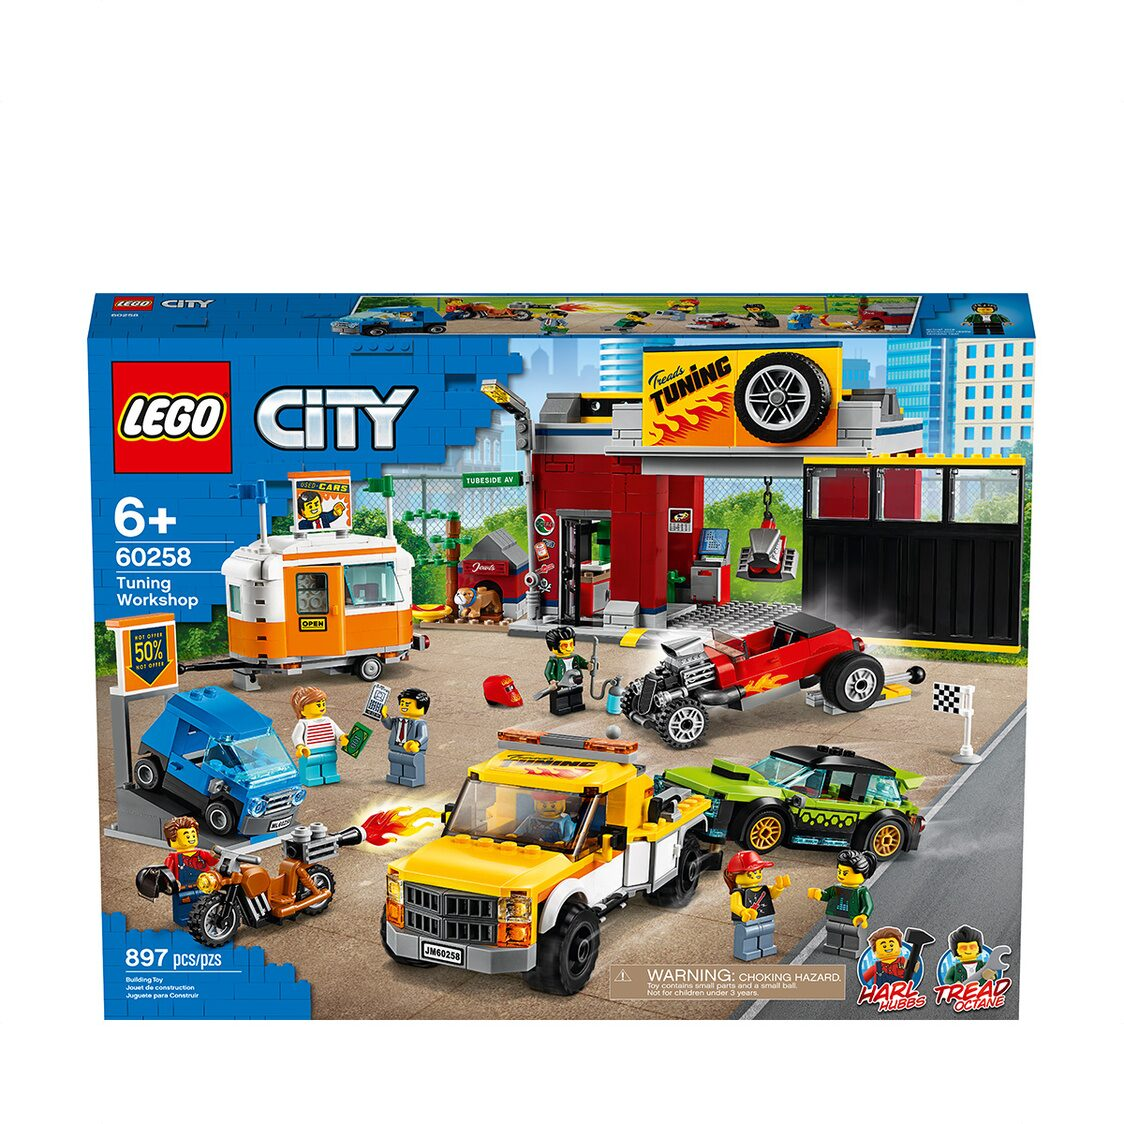 LEGO CITY - Tuning Workshop 60258